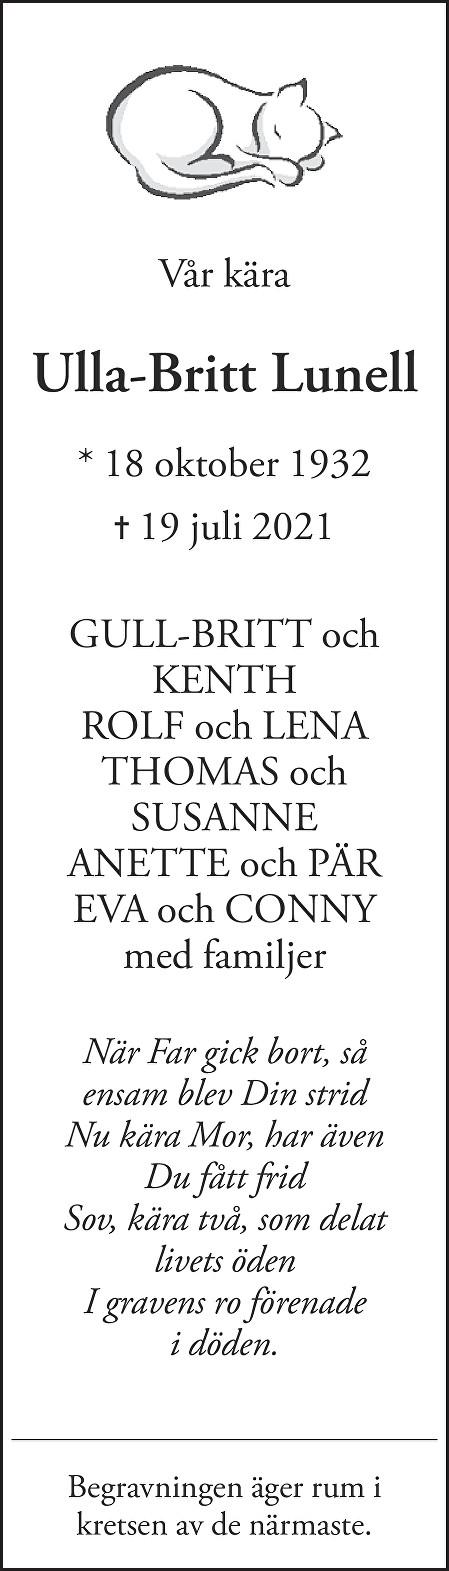 Ulla-Britt Lunell Death notice